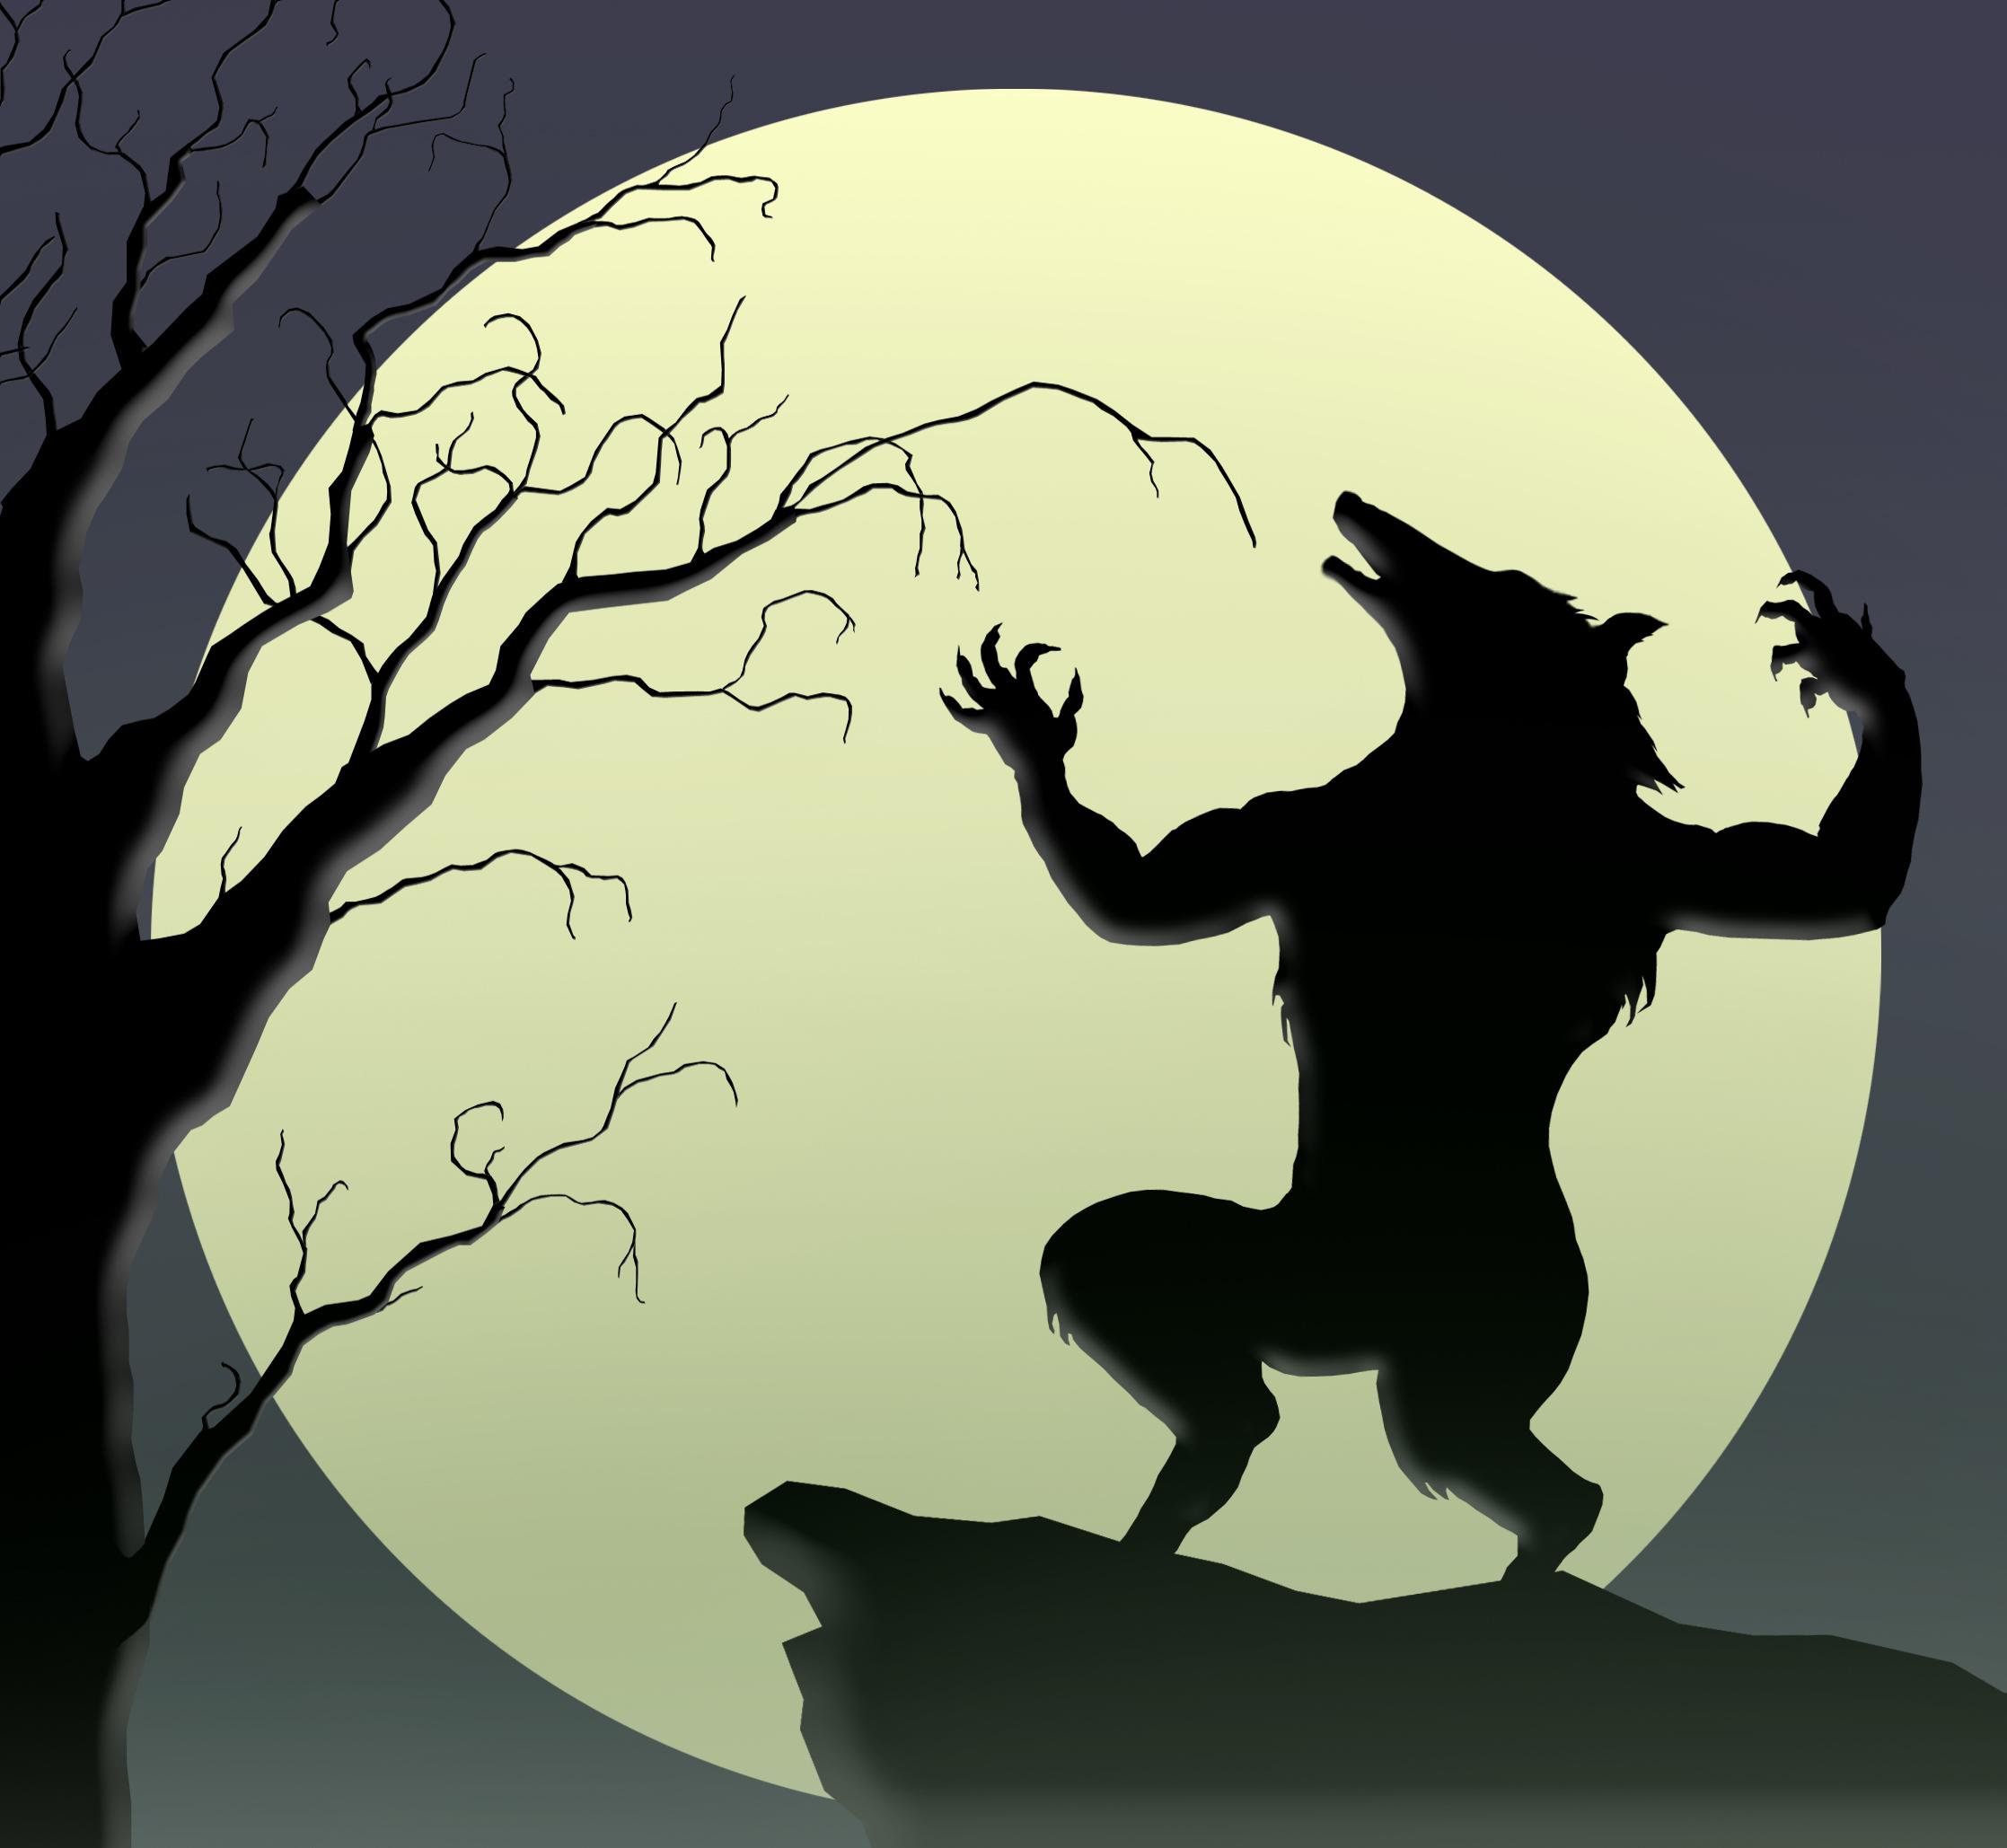 Cartoon werewolf howling at the moon